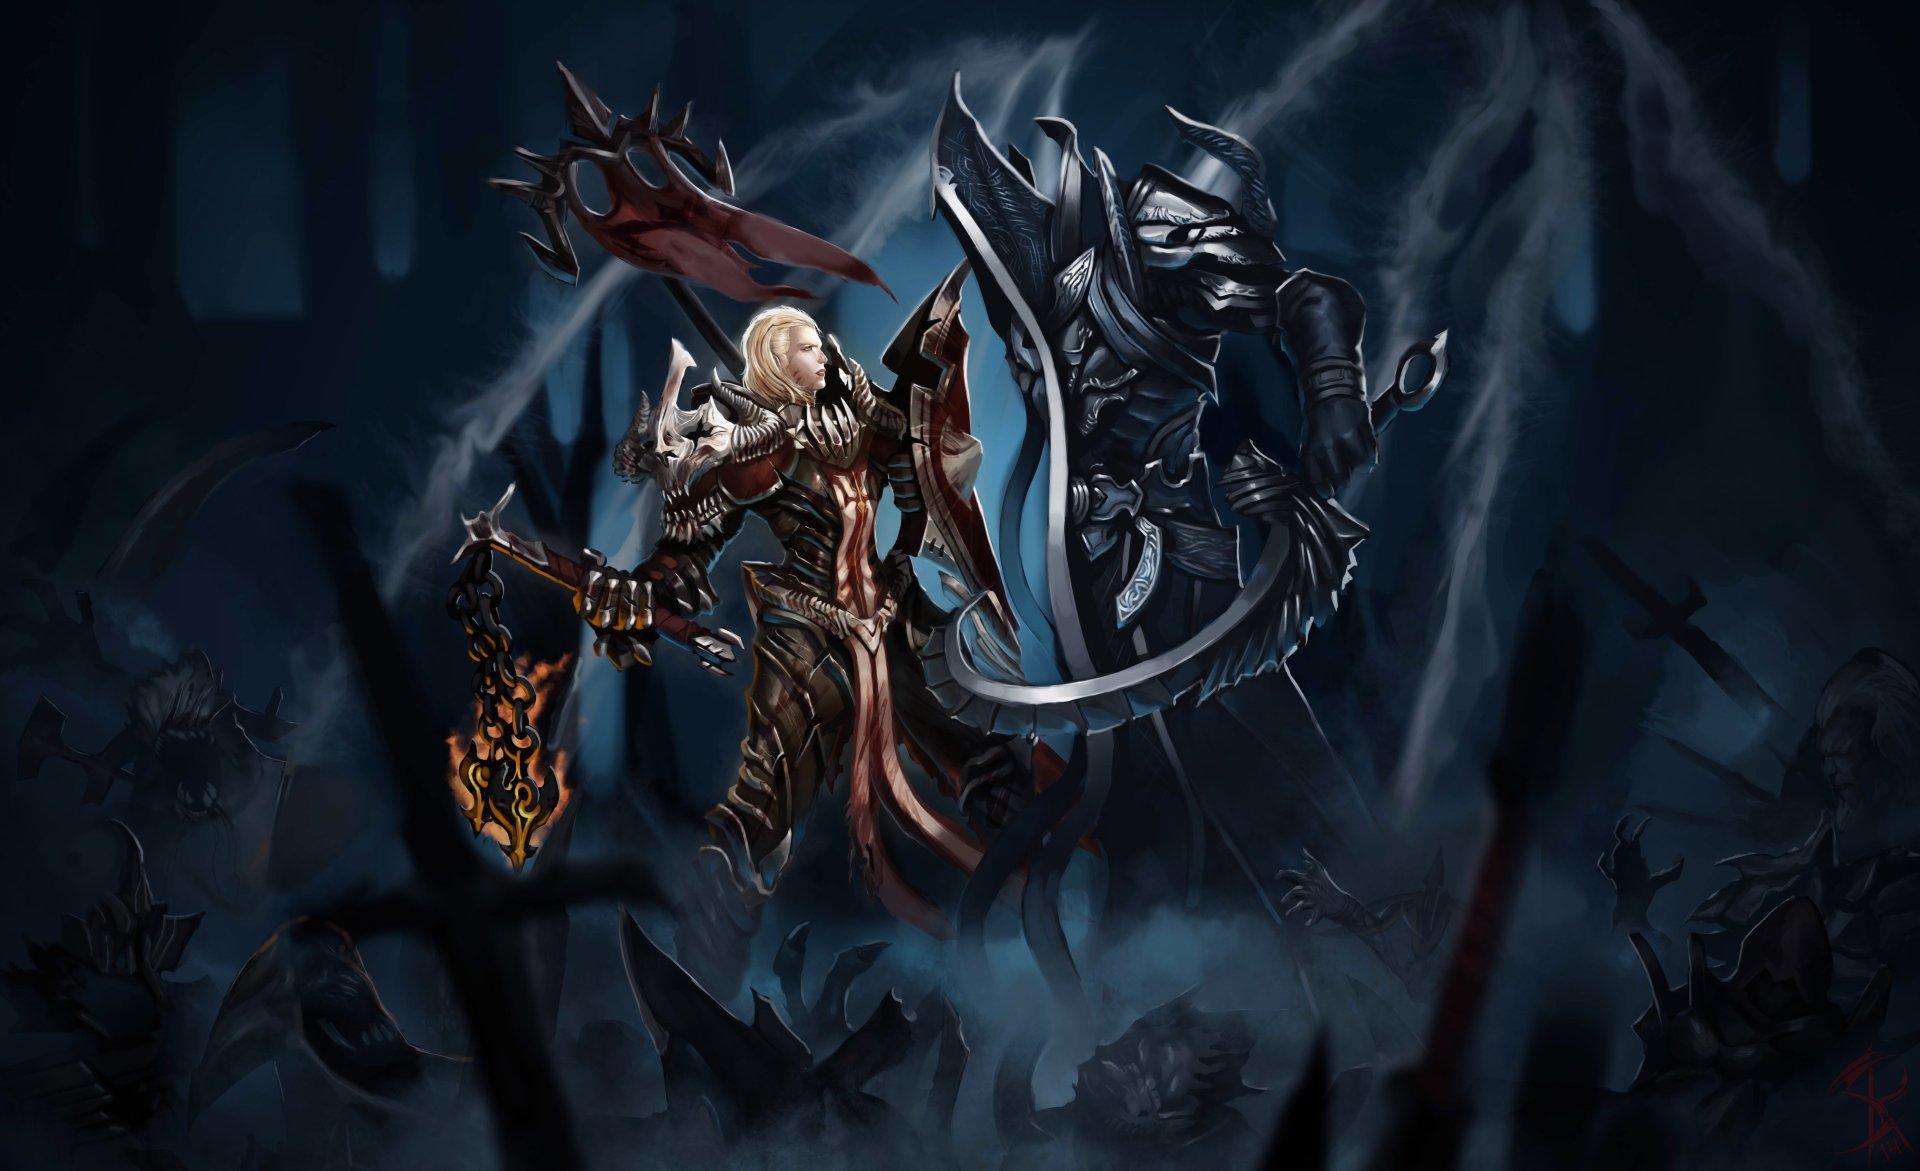 Video Game - Diablo III: Reaper Of Souls  Malthael (Diablo III) Crusader (Diablo III) Wallpaper